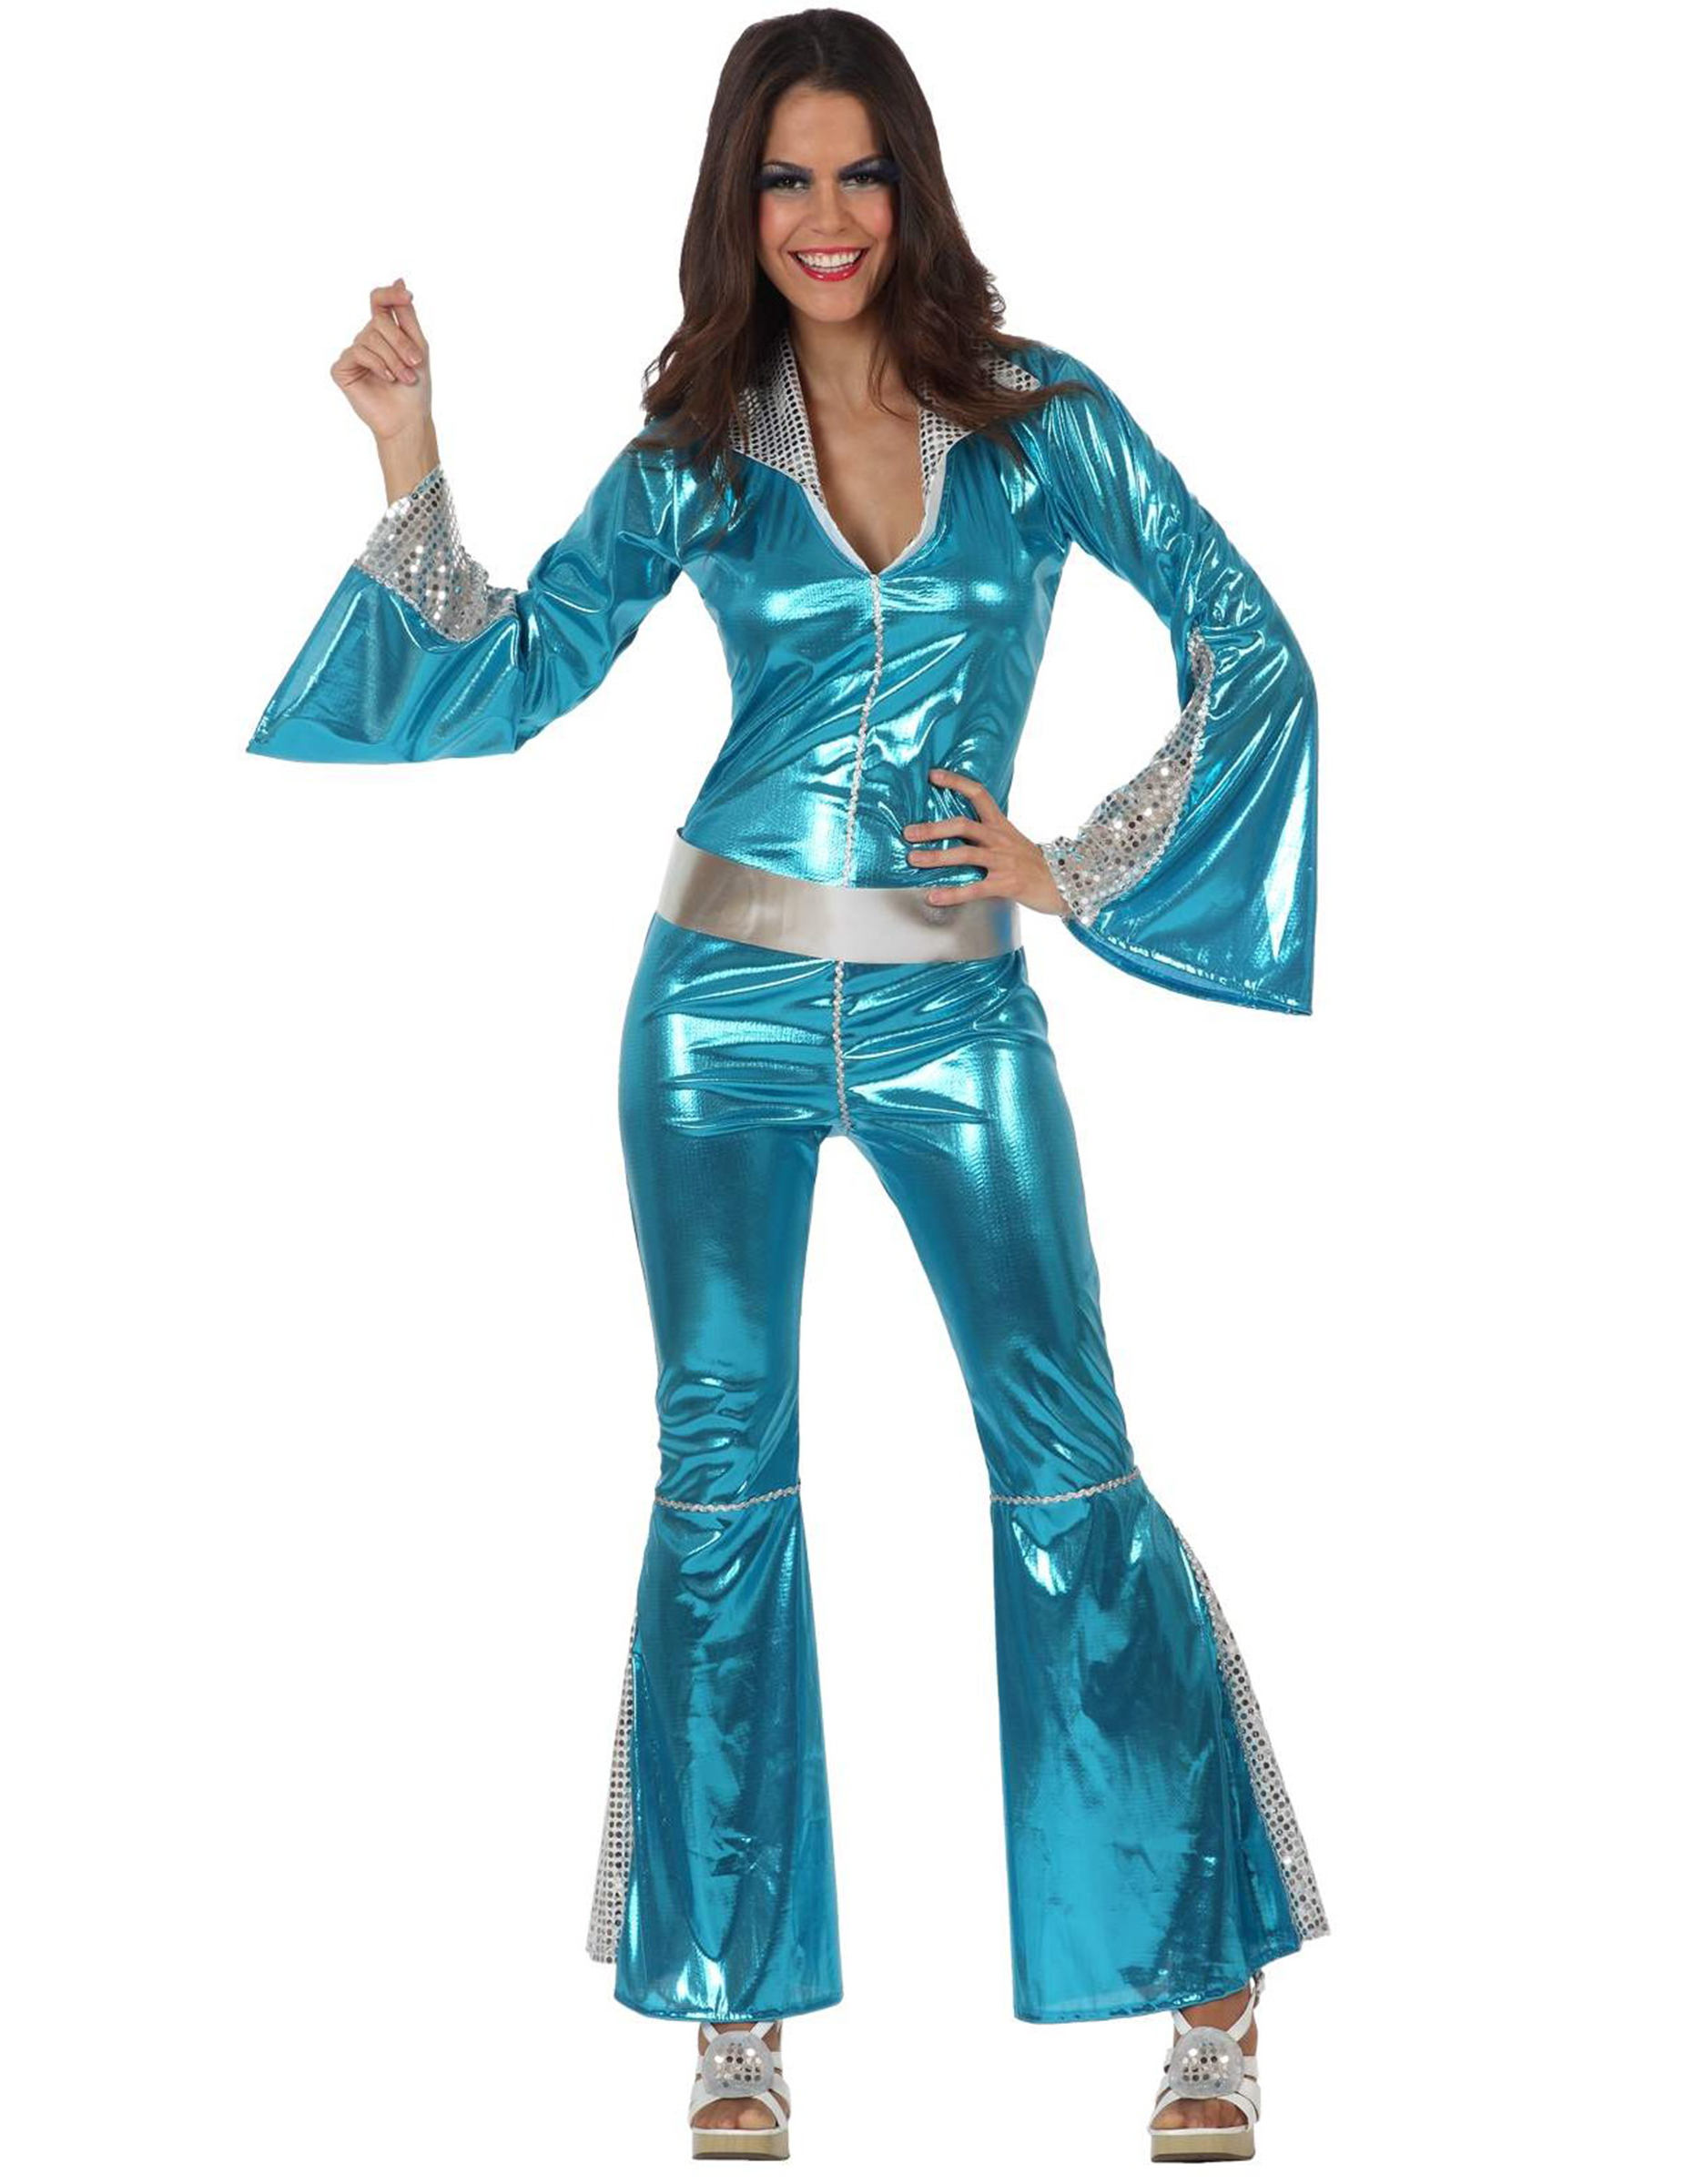 silber blaues disco kost m f r damen kost me f r. Black Bedroom Furniture Sets. Home Design Ideas